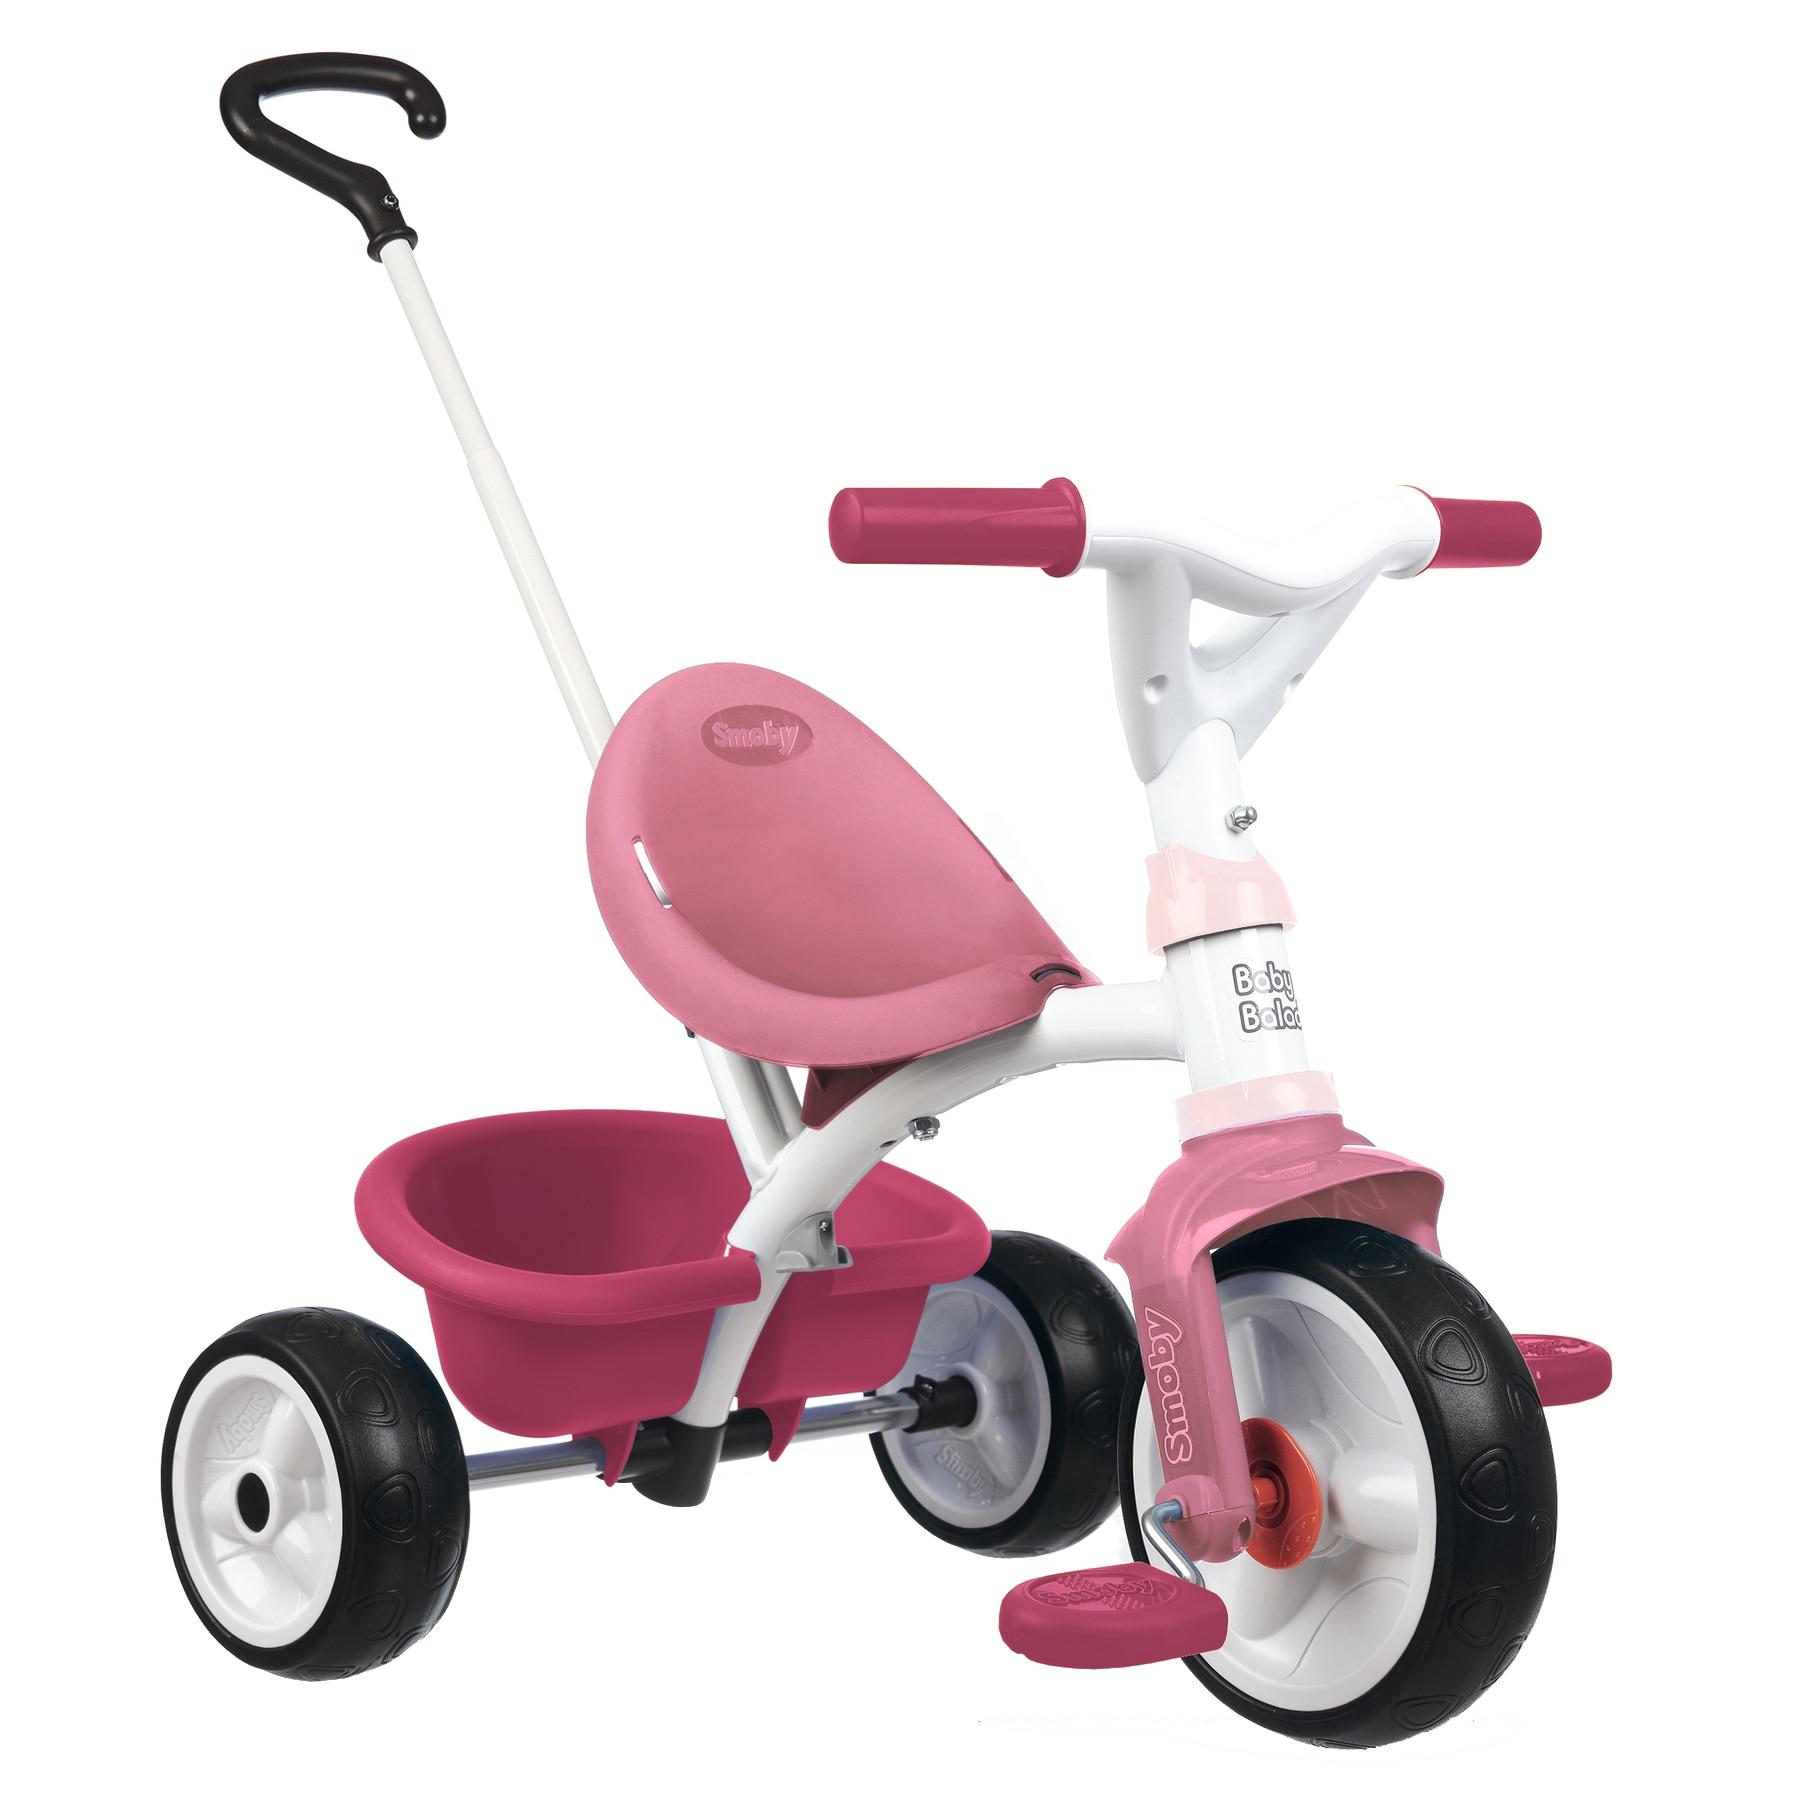 Fotografie Tricicleta Smoby Be Move, cu roti silentioase, roz